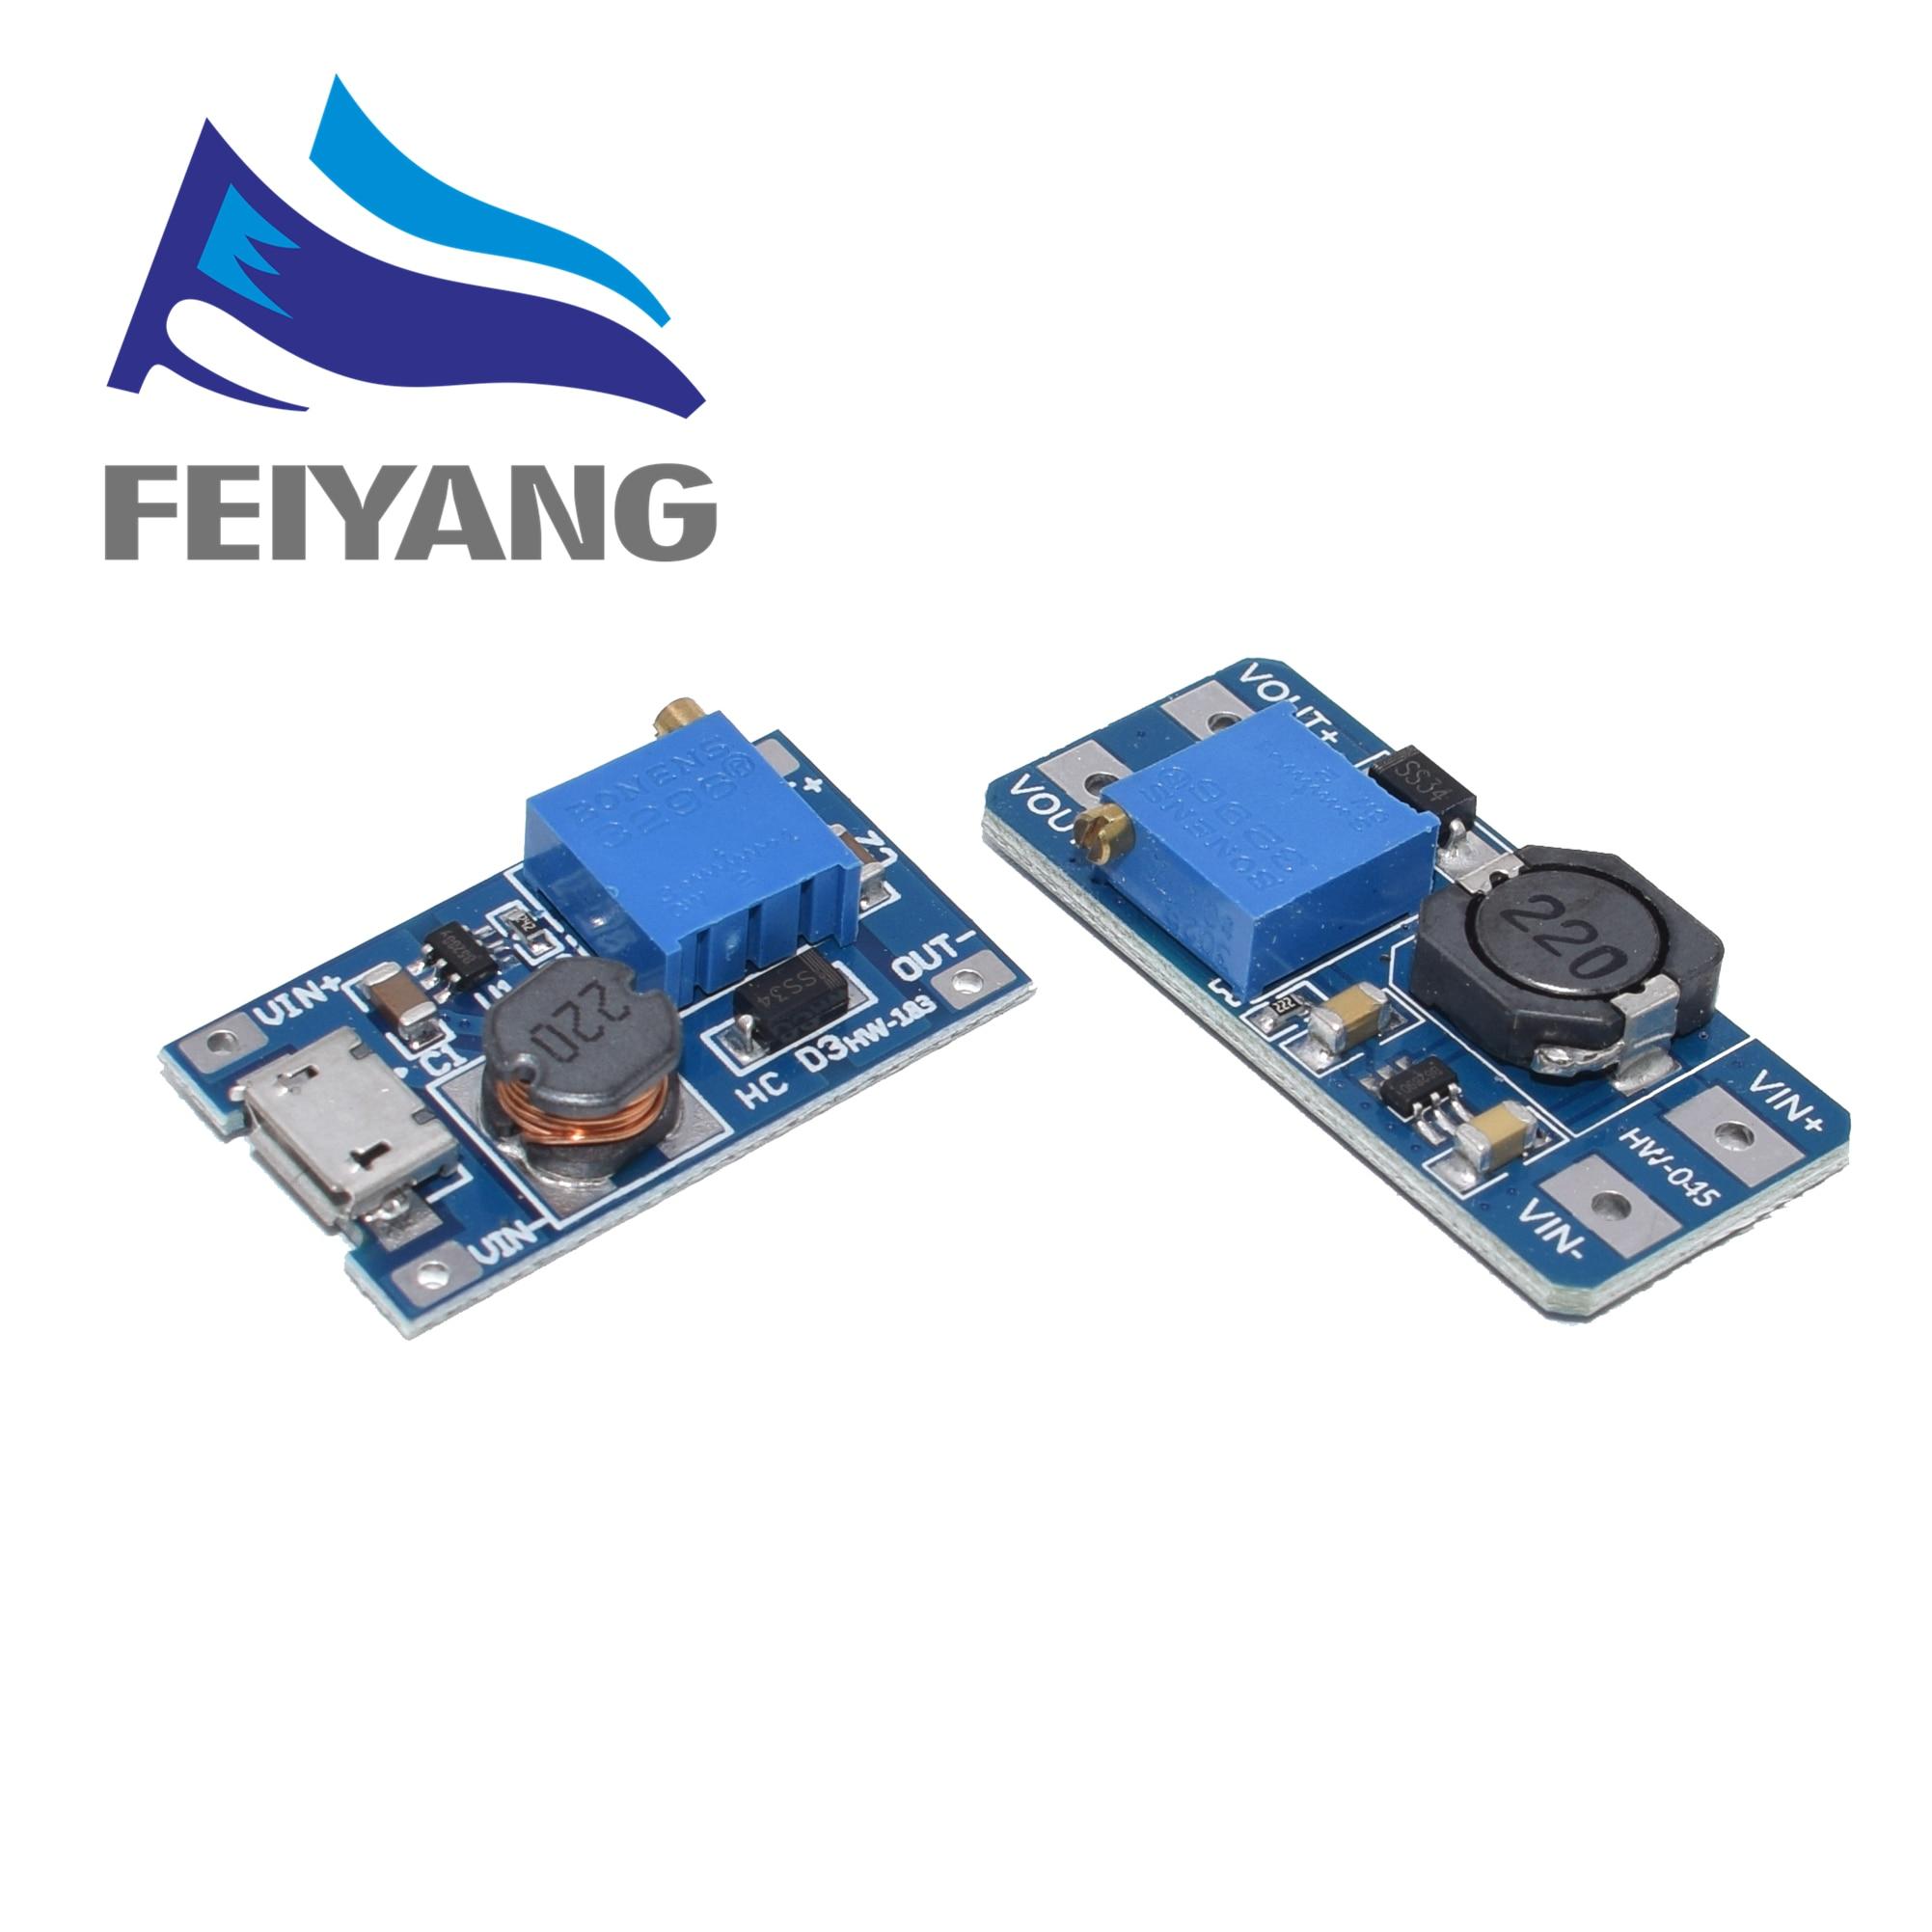 1 шт. MT3608 2A макс. DC DC Повышающий Модуль питания усилитель модуль питания 3 5 в до 5 В/9 В/12 В/24 В|power module|dc-dc step upstep up | АлиЭкспресс